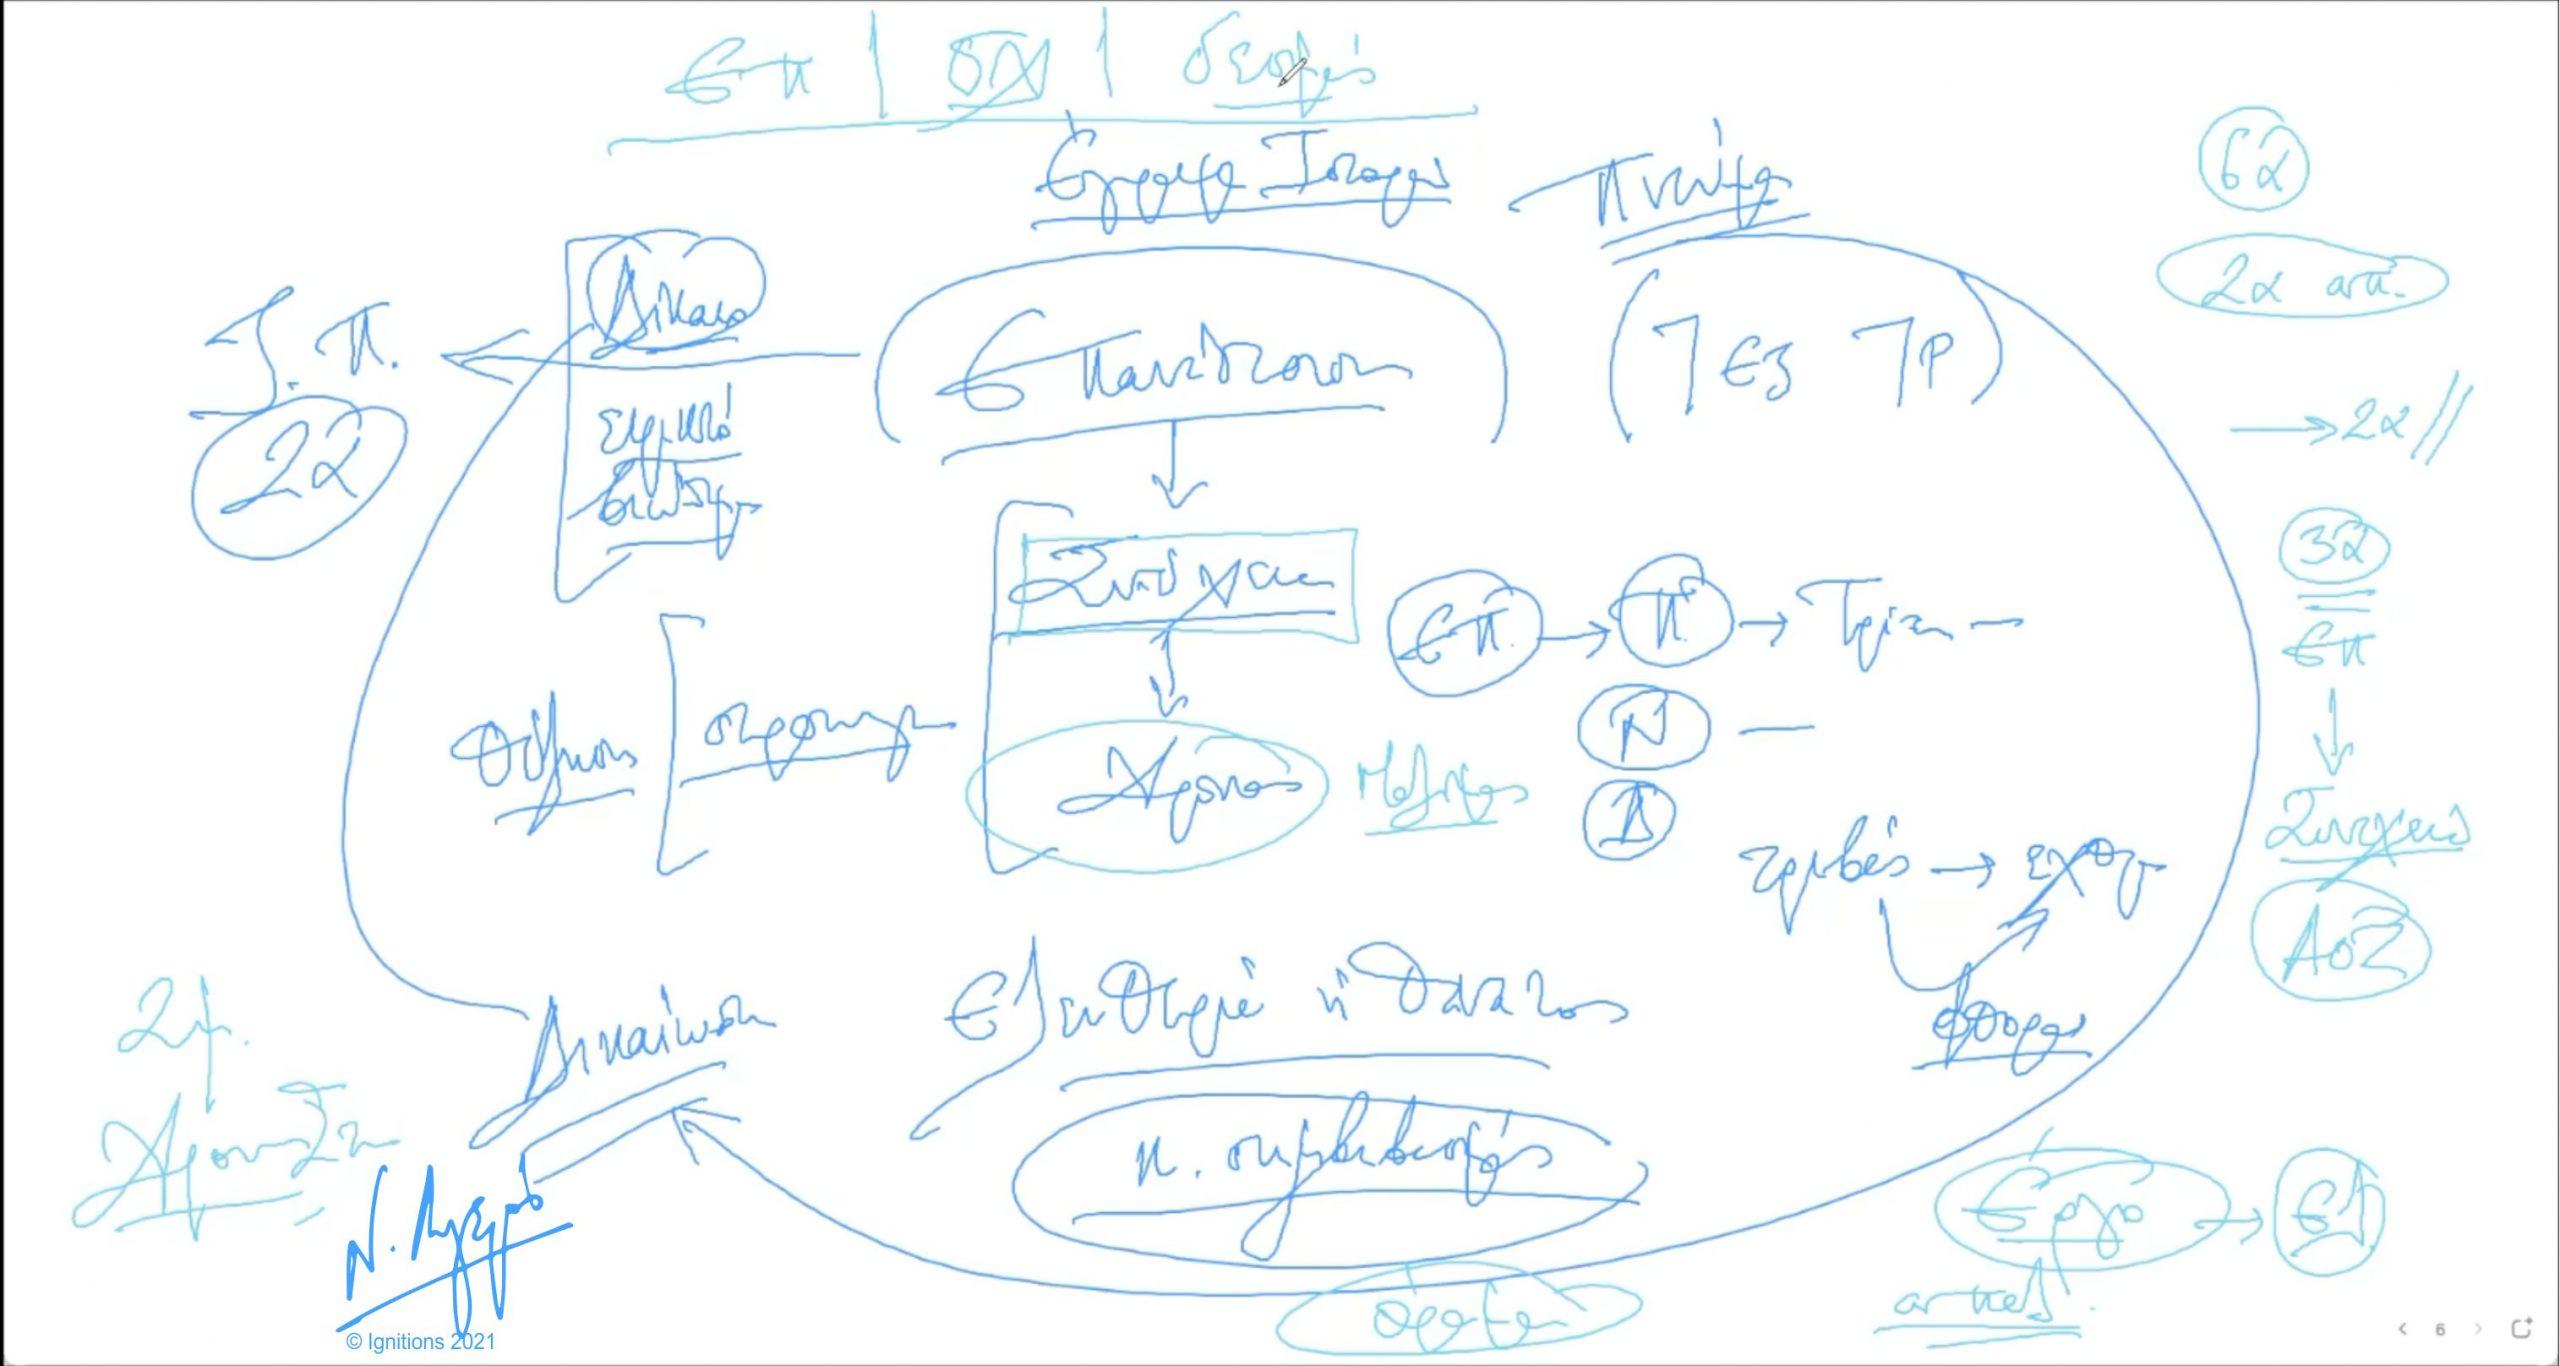 60222 - VI - e-Διάλεξη: Η στρατηγική εμβέλεια της Ελληνικής Επανάστασης. (Dessin)